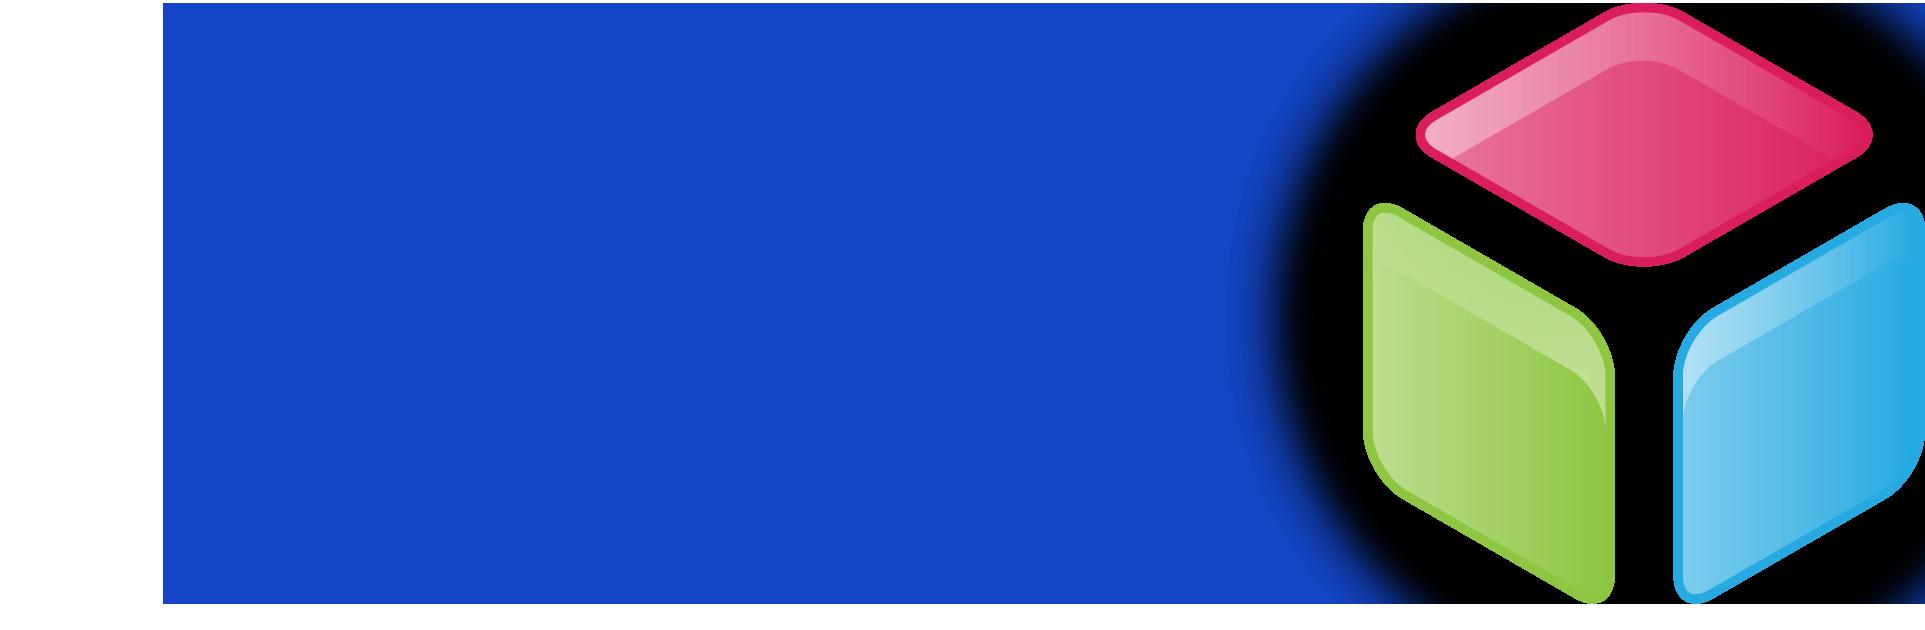 בן ציון א. כהן